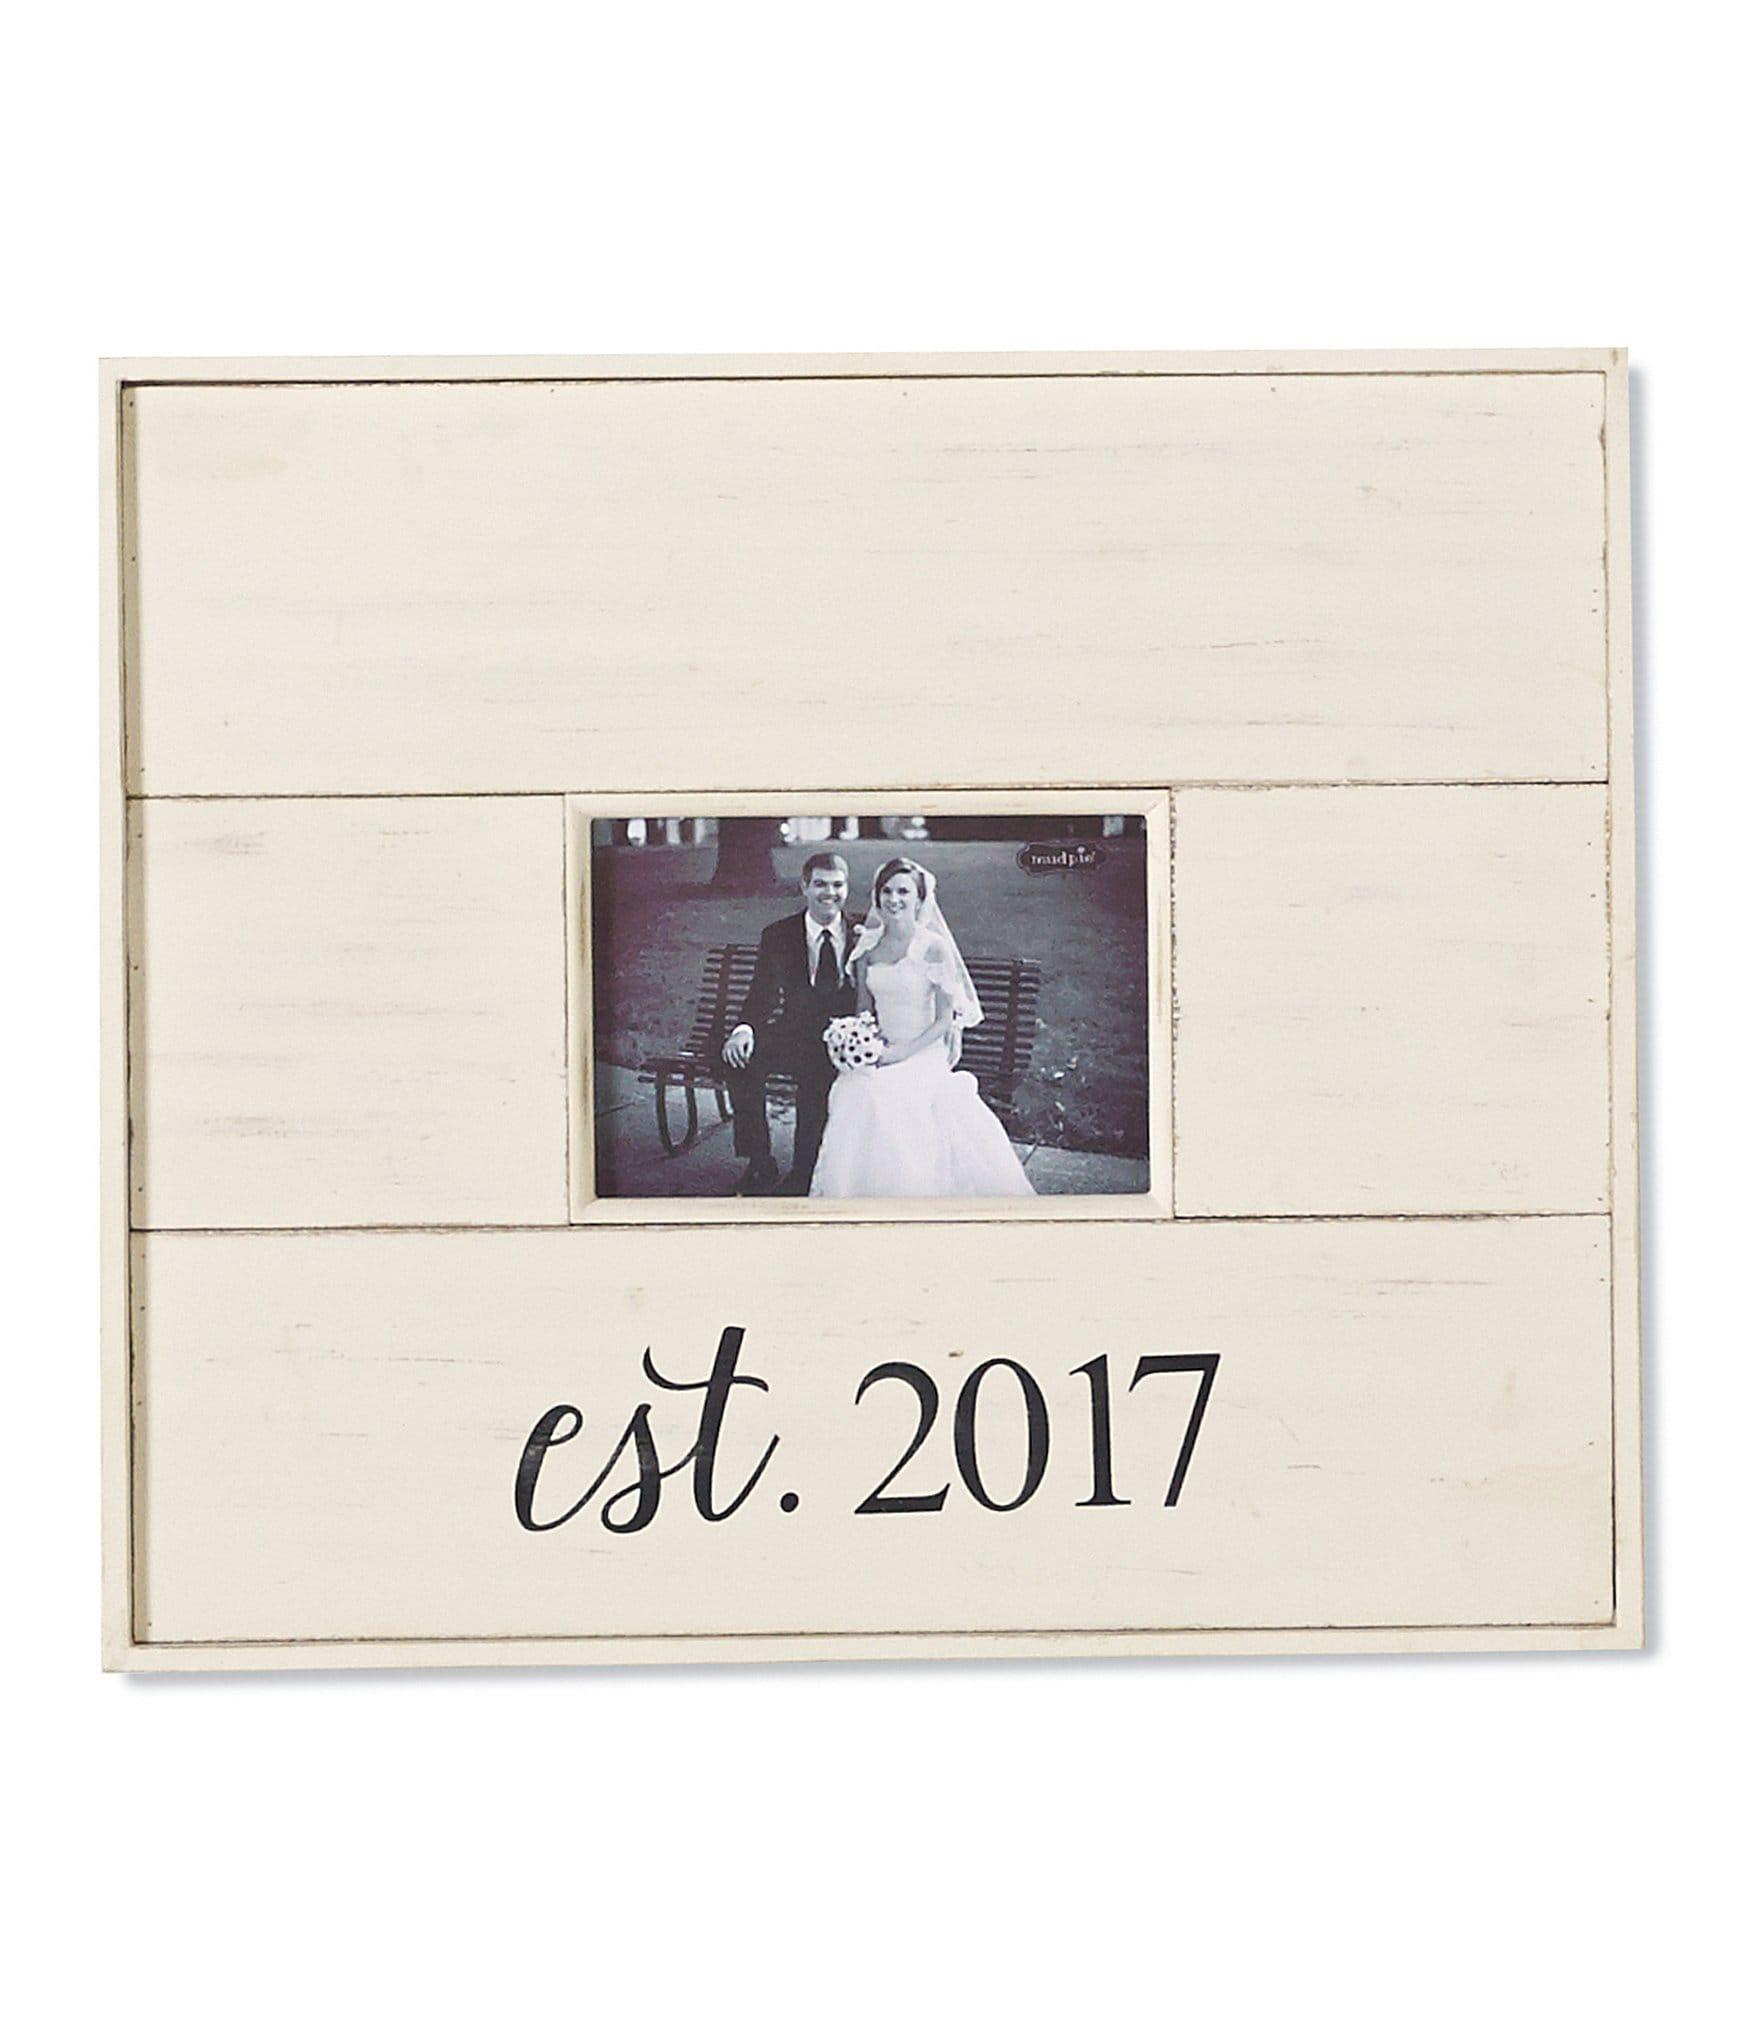 Dillard S Wedding Registry: Mud Pie Wedding Collection Est. 2017 Distressed Wood Frame